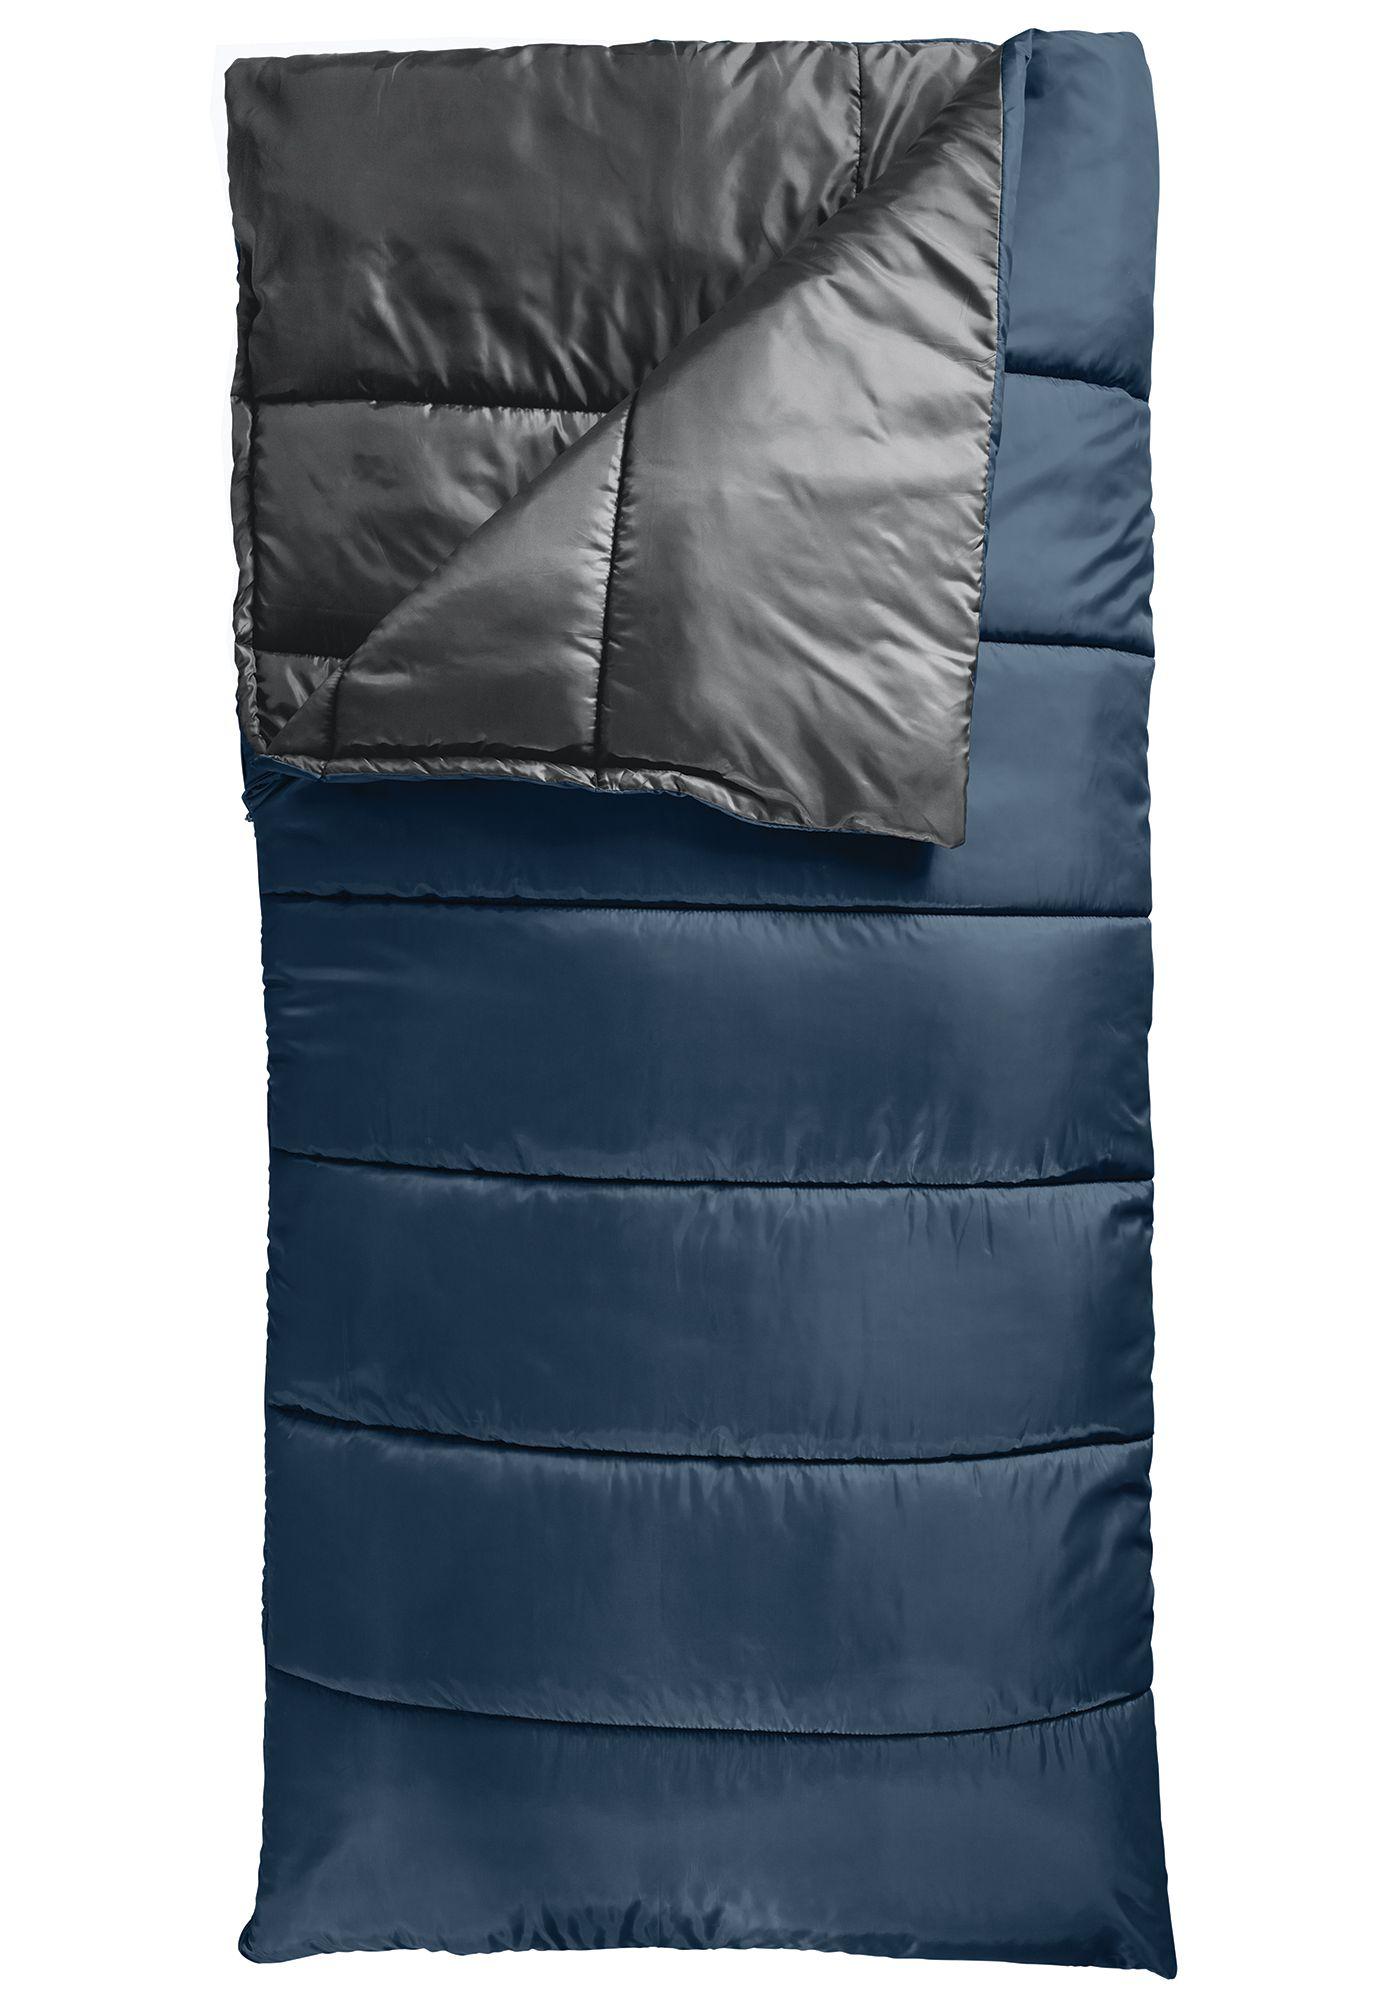 Field & Stream Oversized Recreational 40° Sleeping Bag